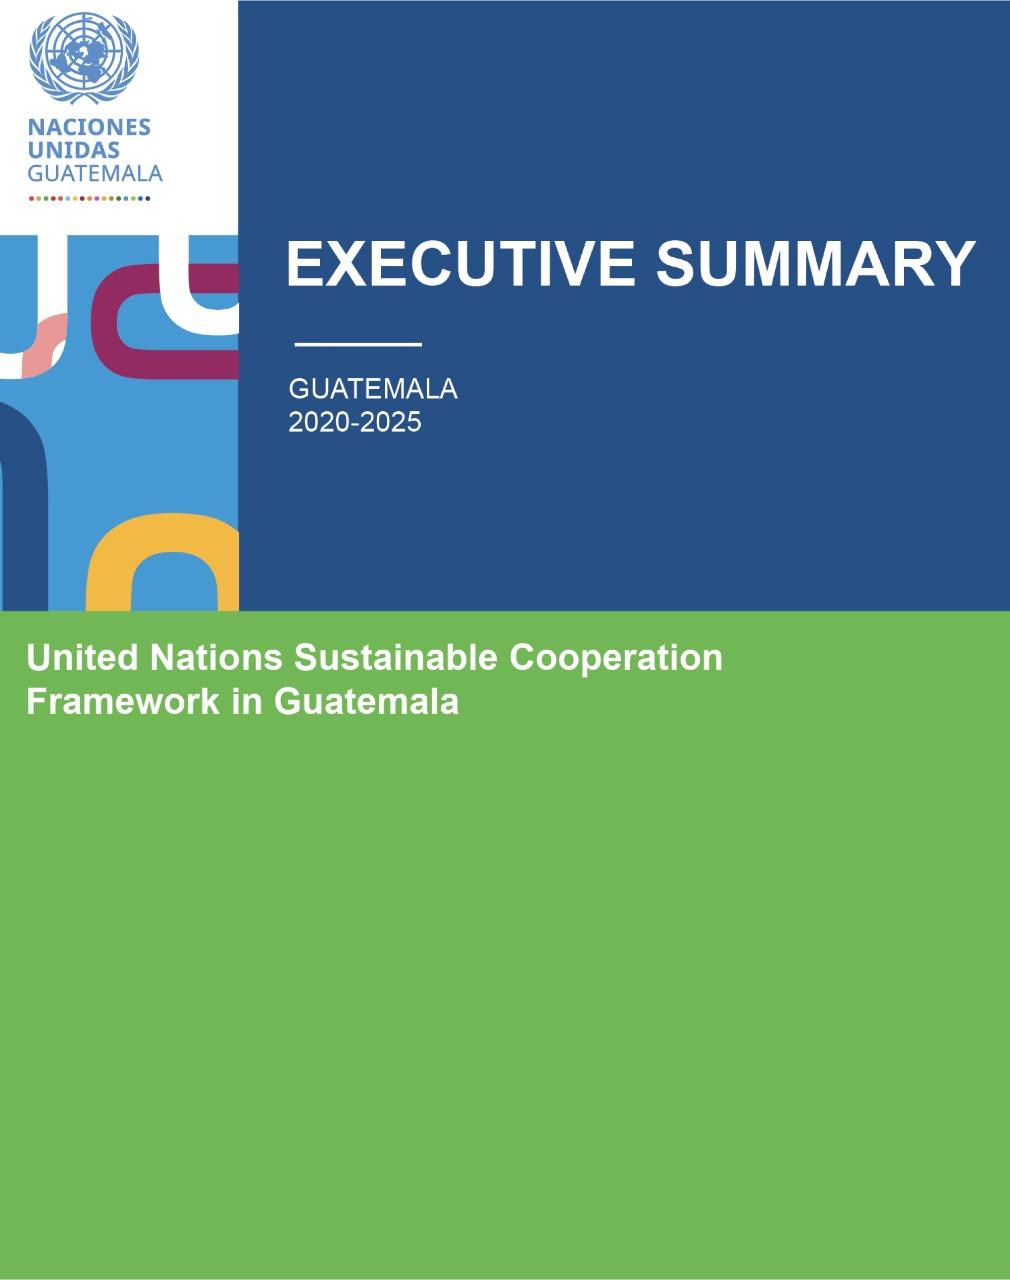 EXECUTIVE SUMMARY UN Cooperation Framework GT